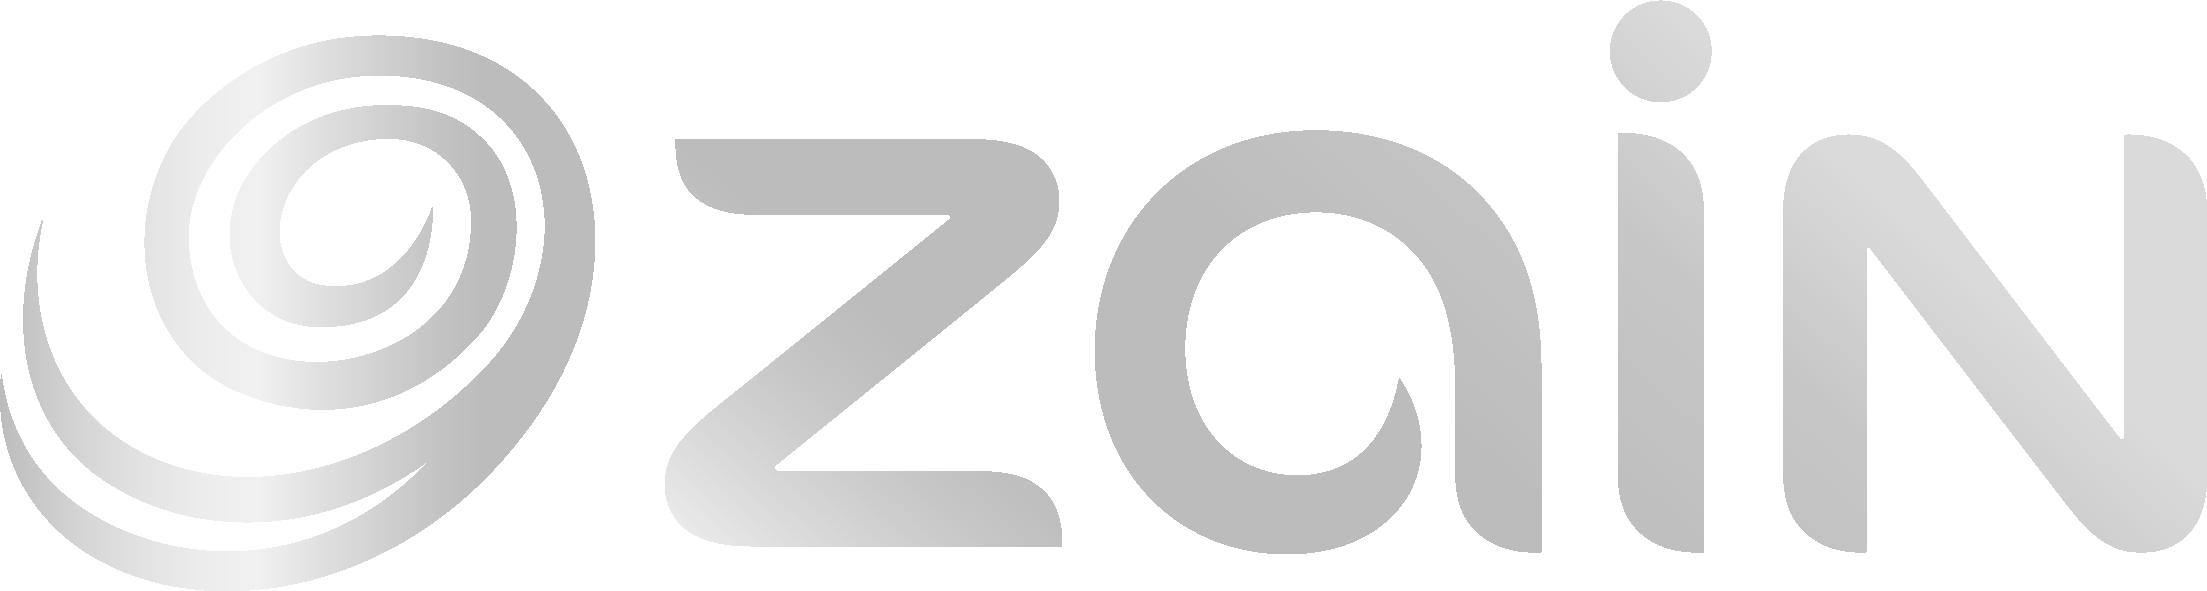 Zain Competitors, Revenue and Employees - Owler Company Profile